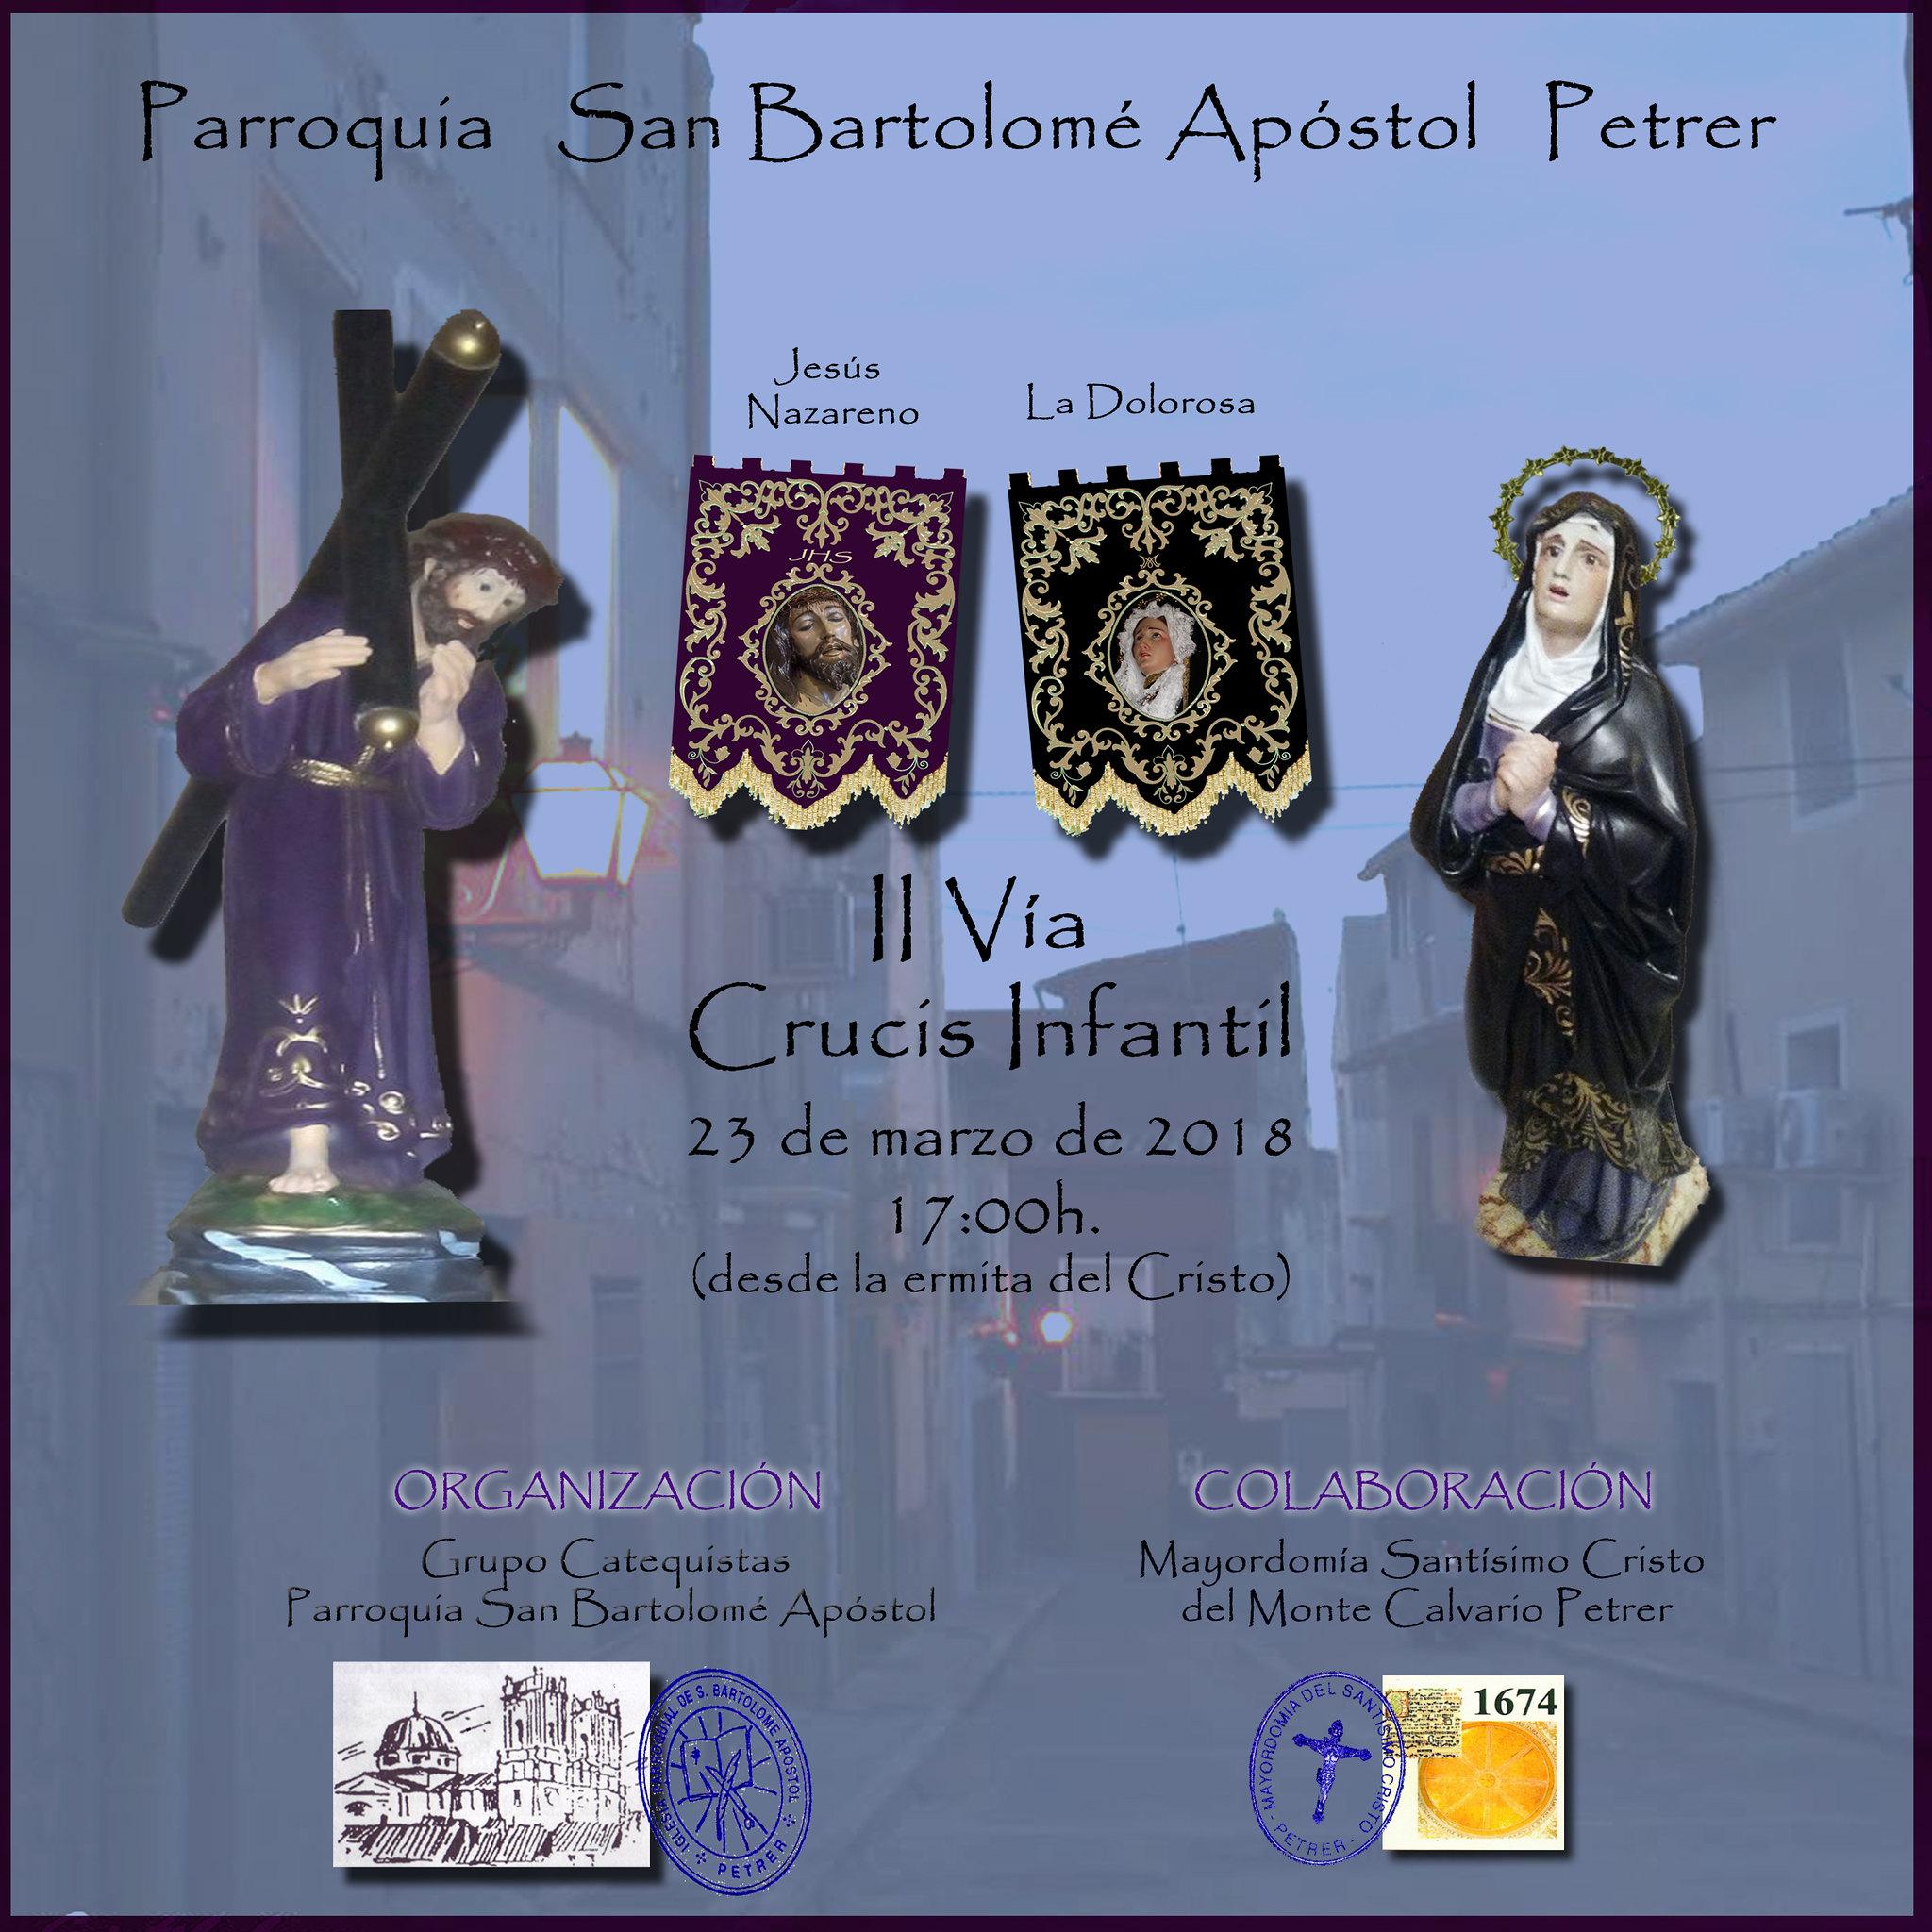 II Vía Crucis Infantil (2018-03-23)